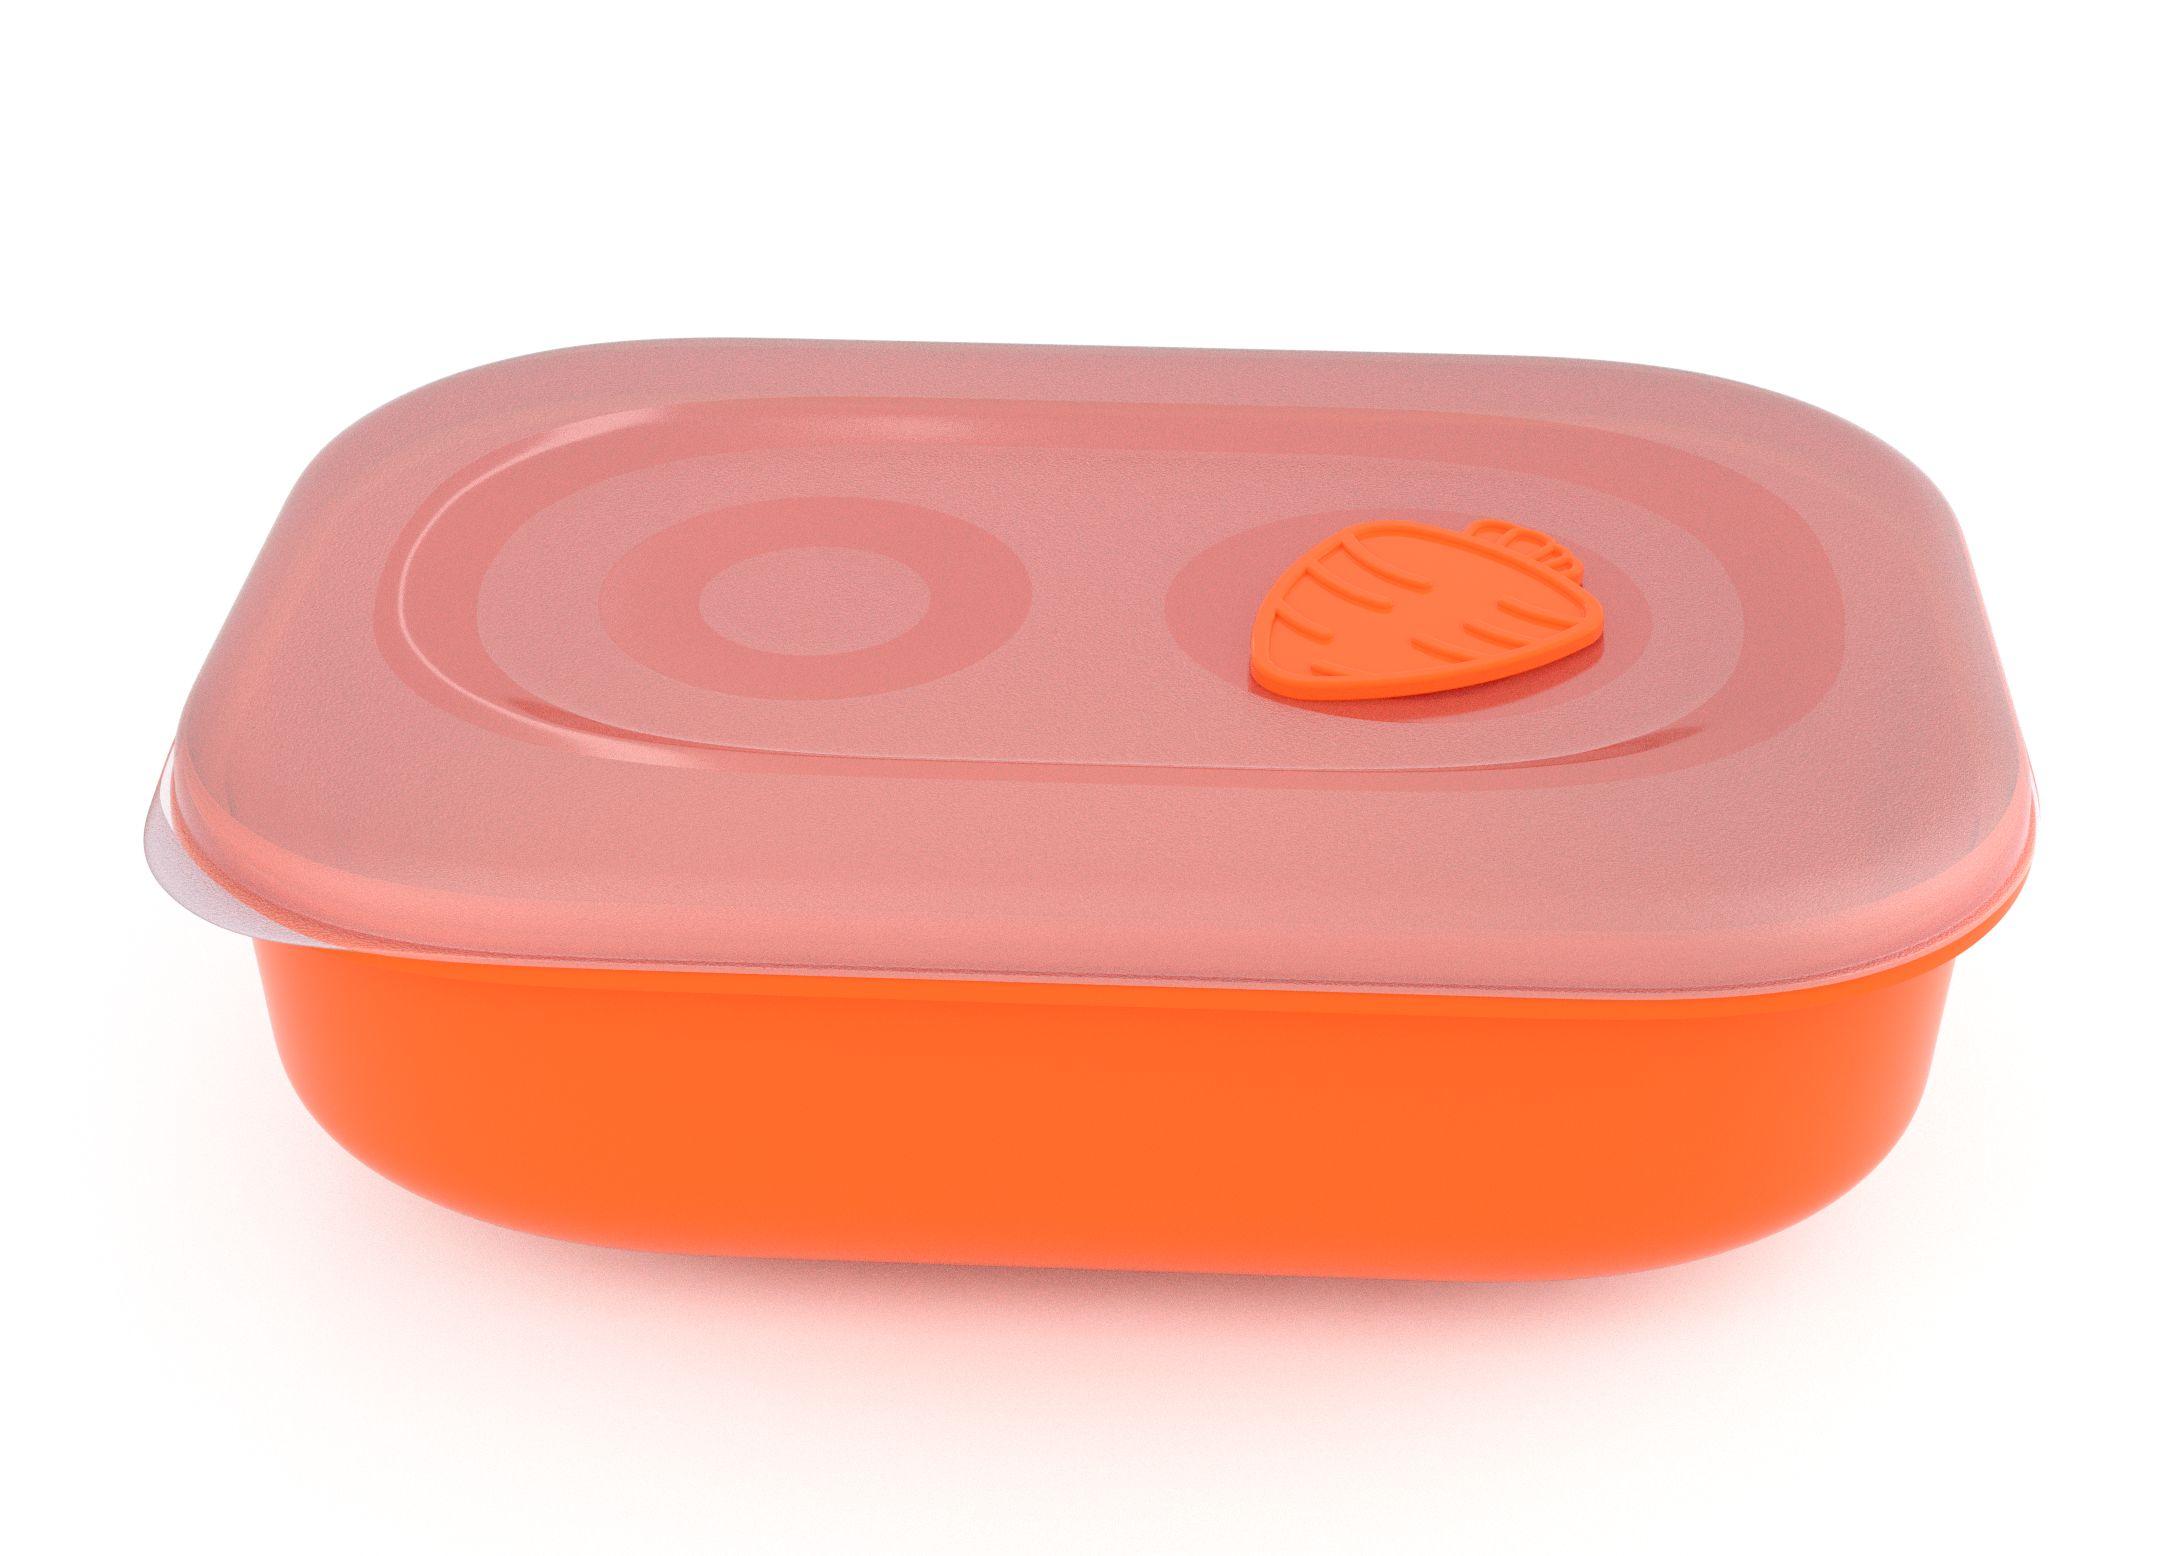 Tama Lock Rectangular Food Container 3l 9301 with Steam Release Carrot Valve Orange